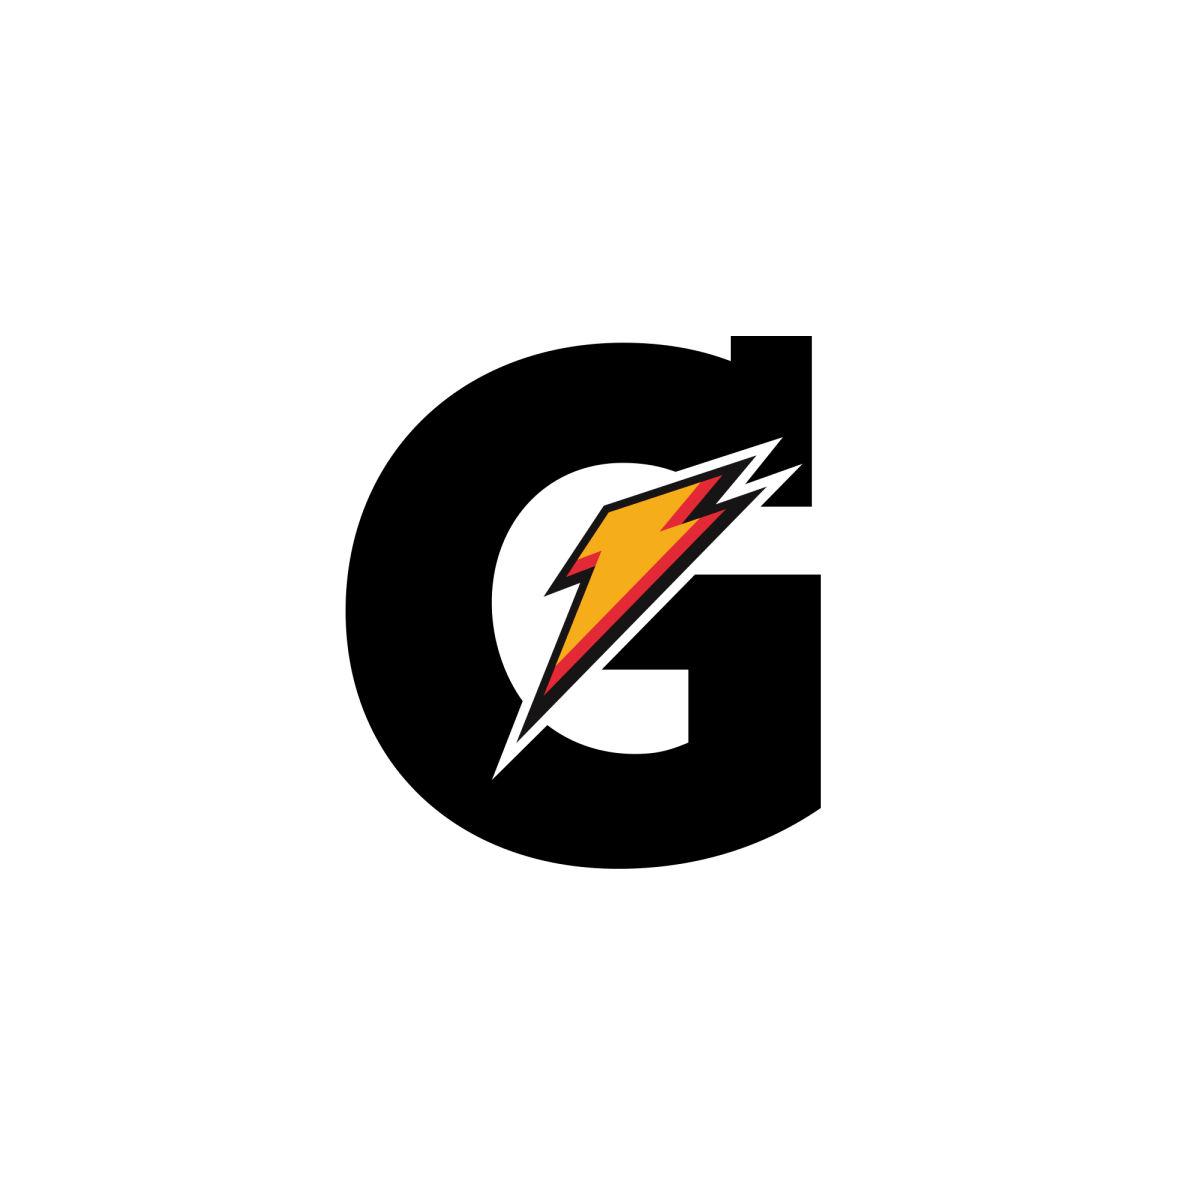 Gatorade Logo - G with Lightning bolt